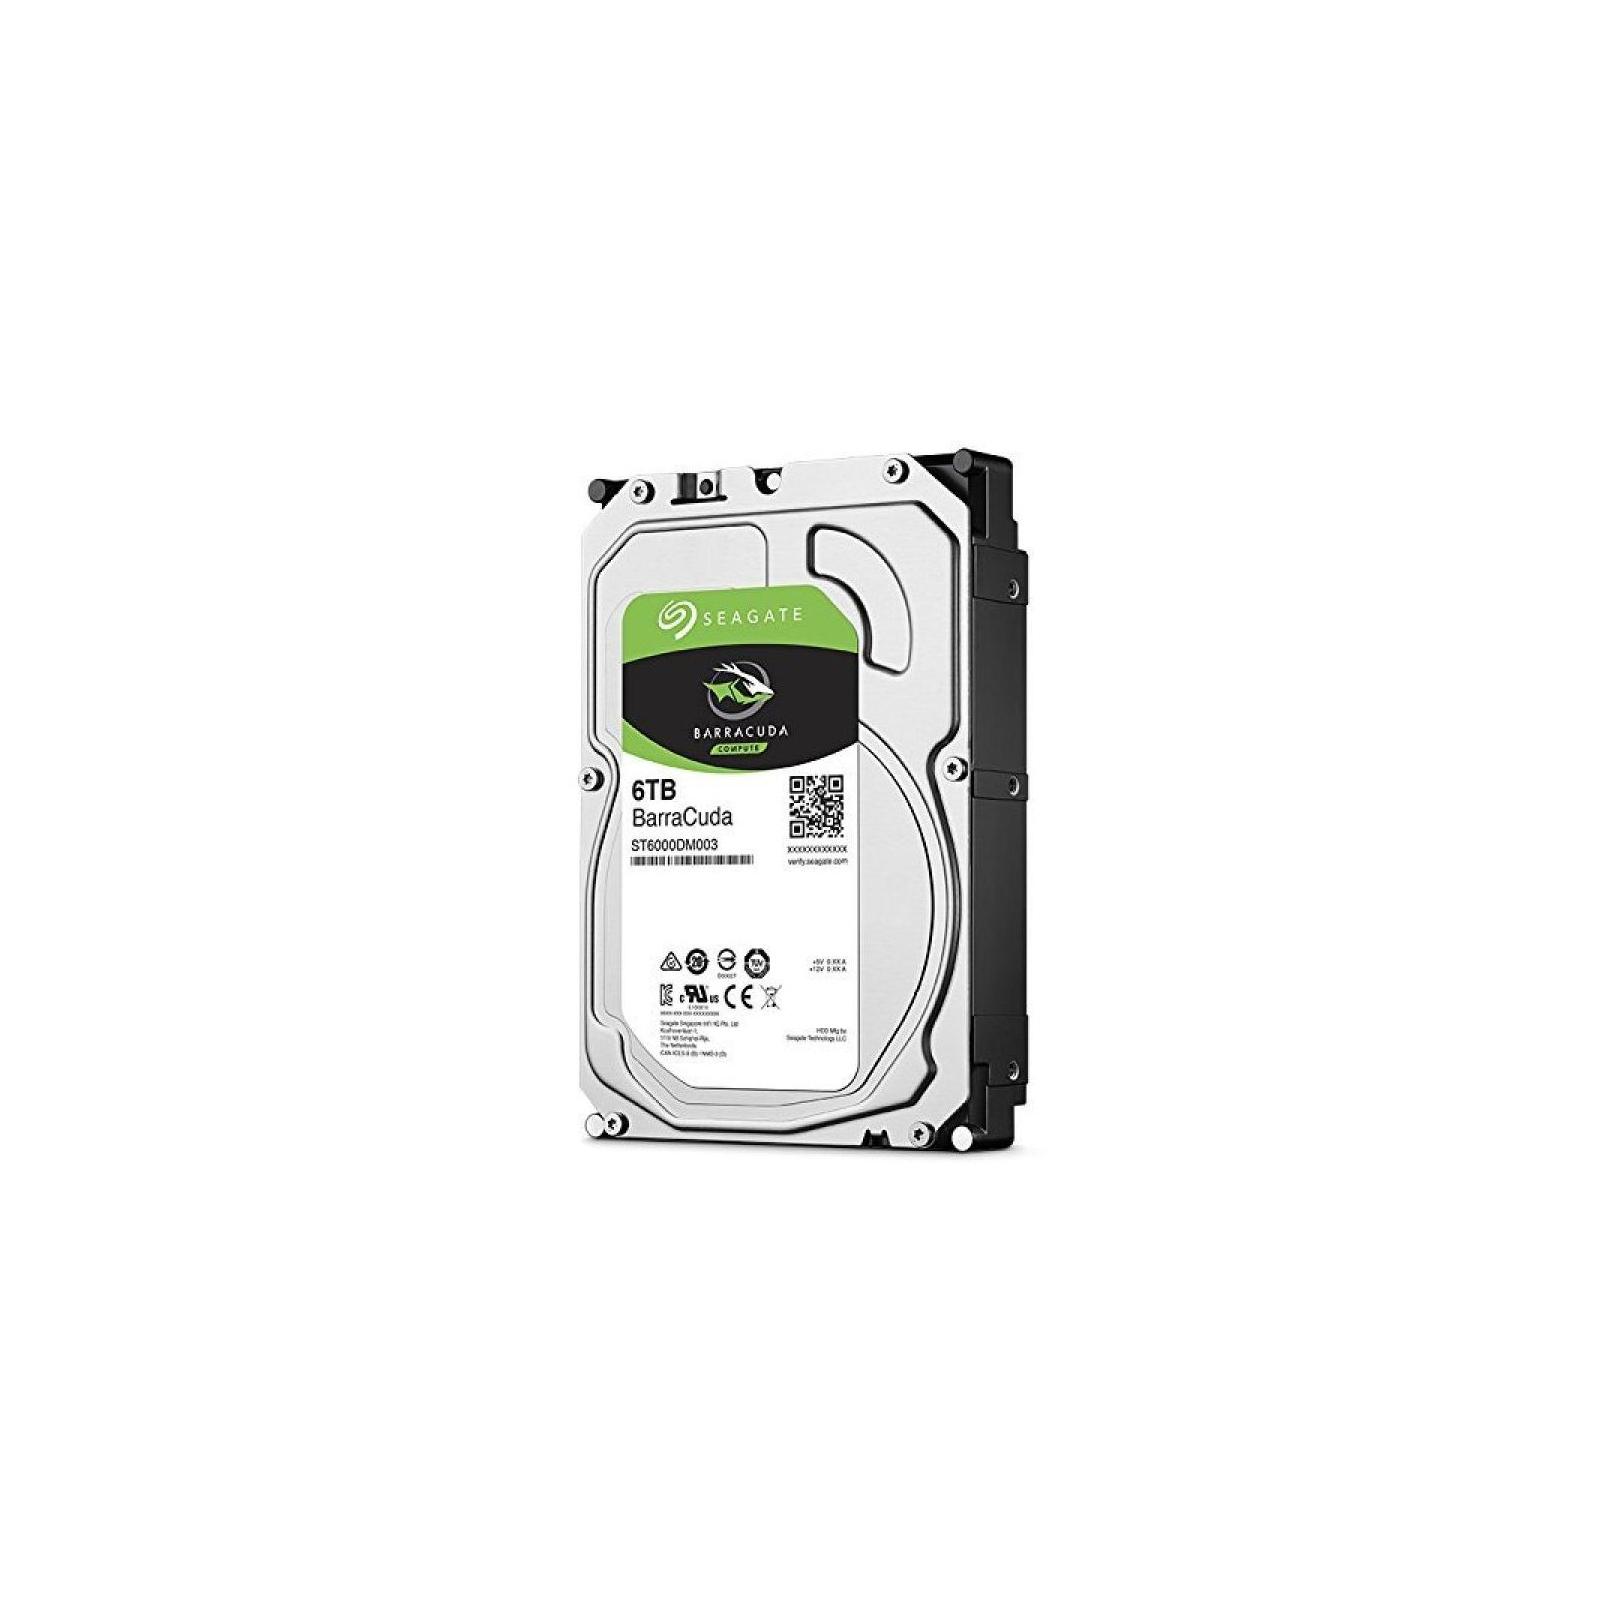 "Жесткий диск 3.5"" 2TB Seagate (ST2000DM001) изображение 3"